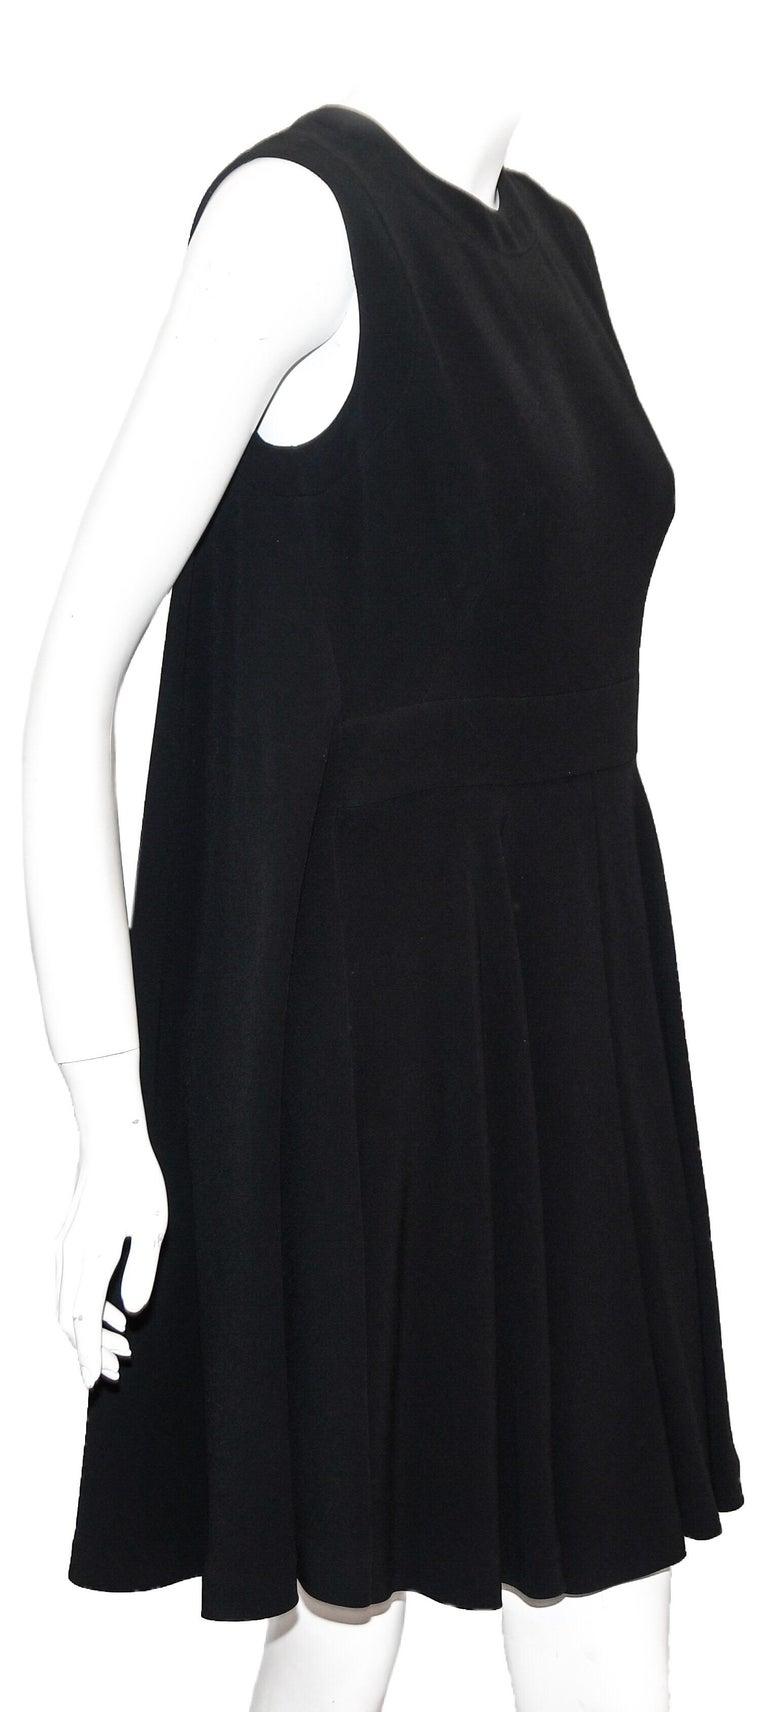 Women's Ambitious Alexander McQueen Black Paneled Sleeveless Dress For Sale